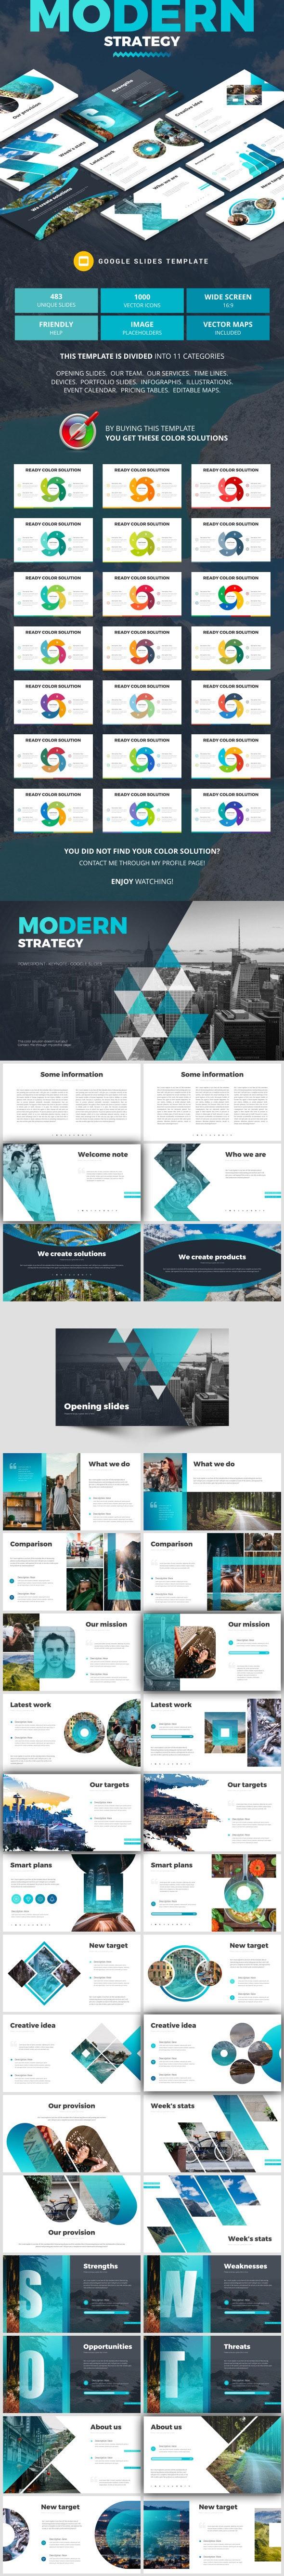 Modern Strategy - Google Slides Presentation Templates